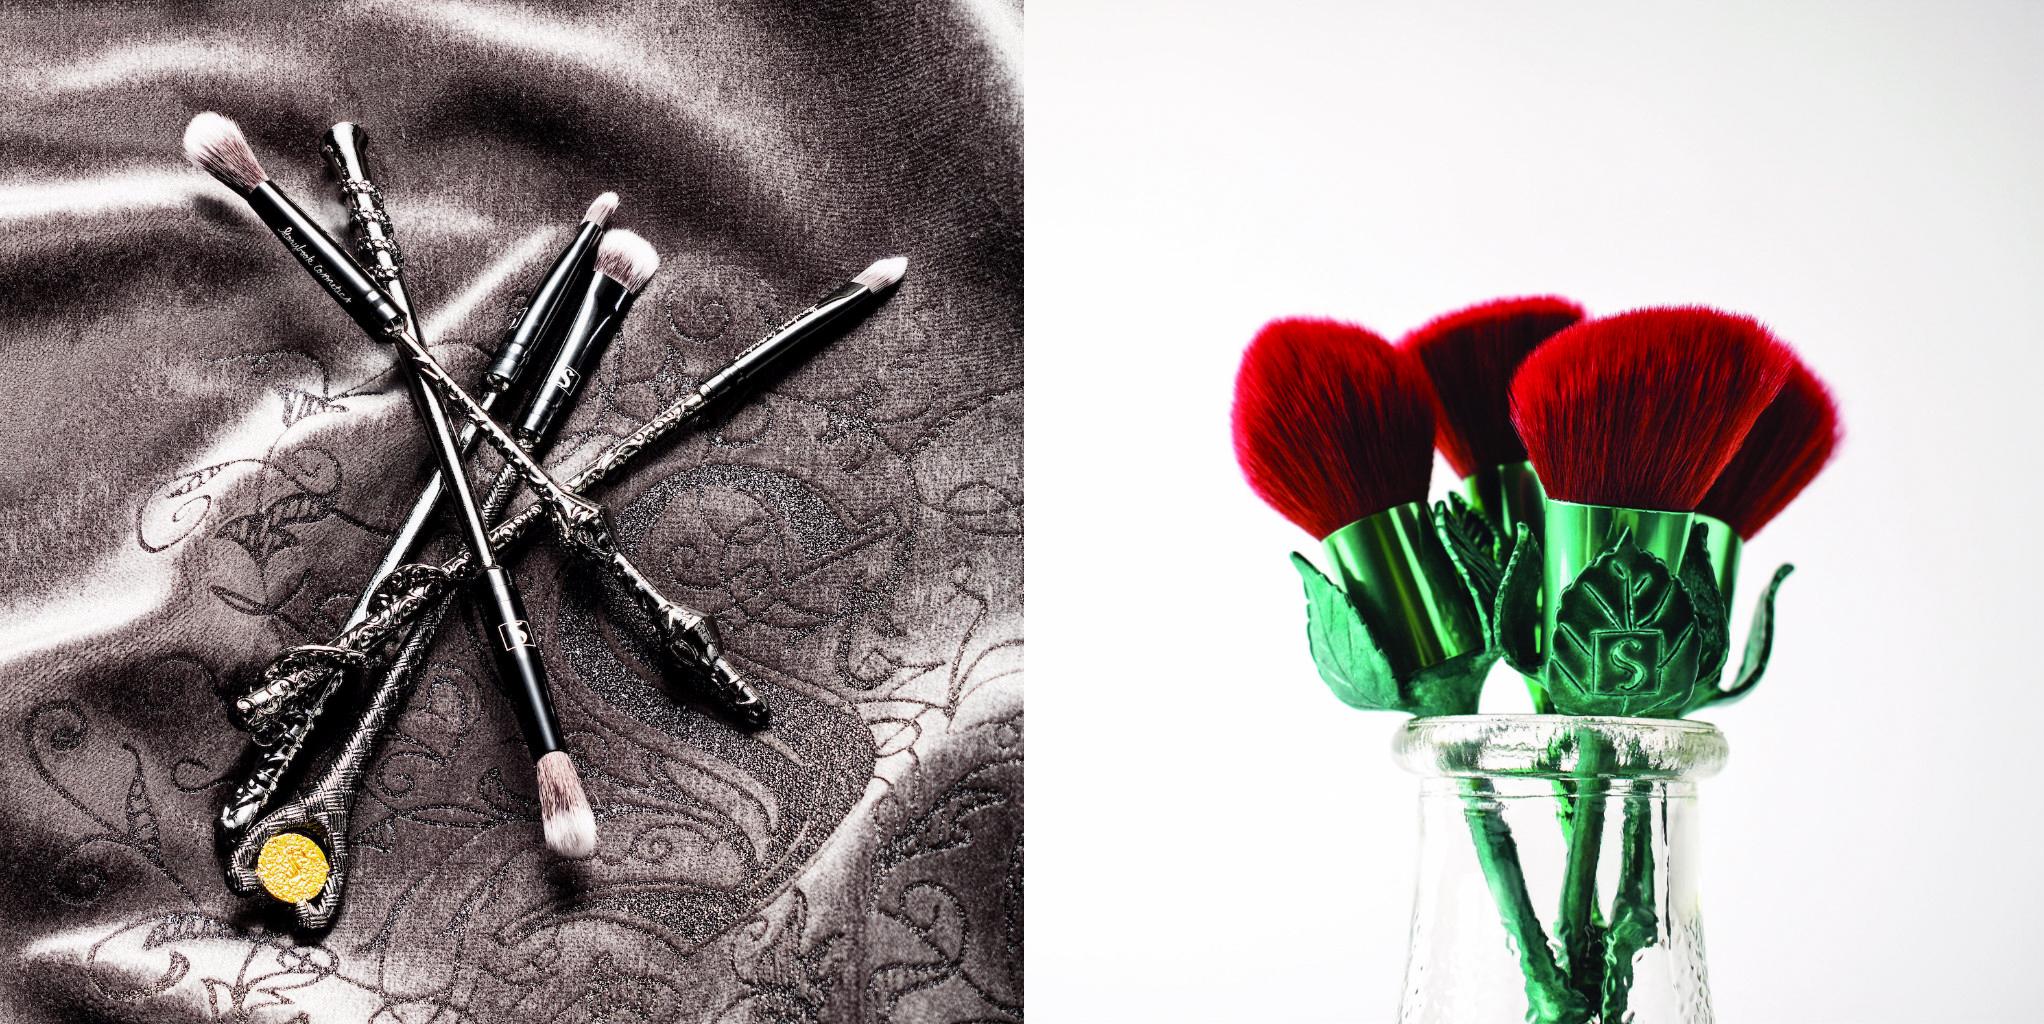 storybook cosmetics brushes